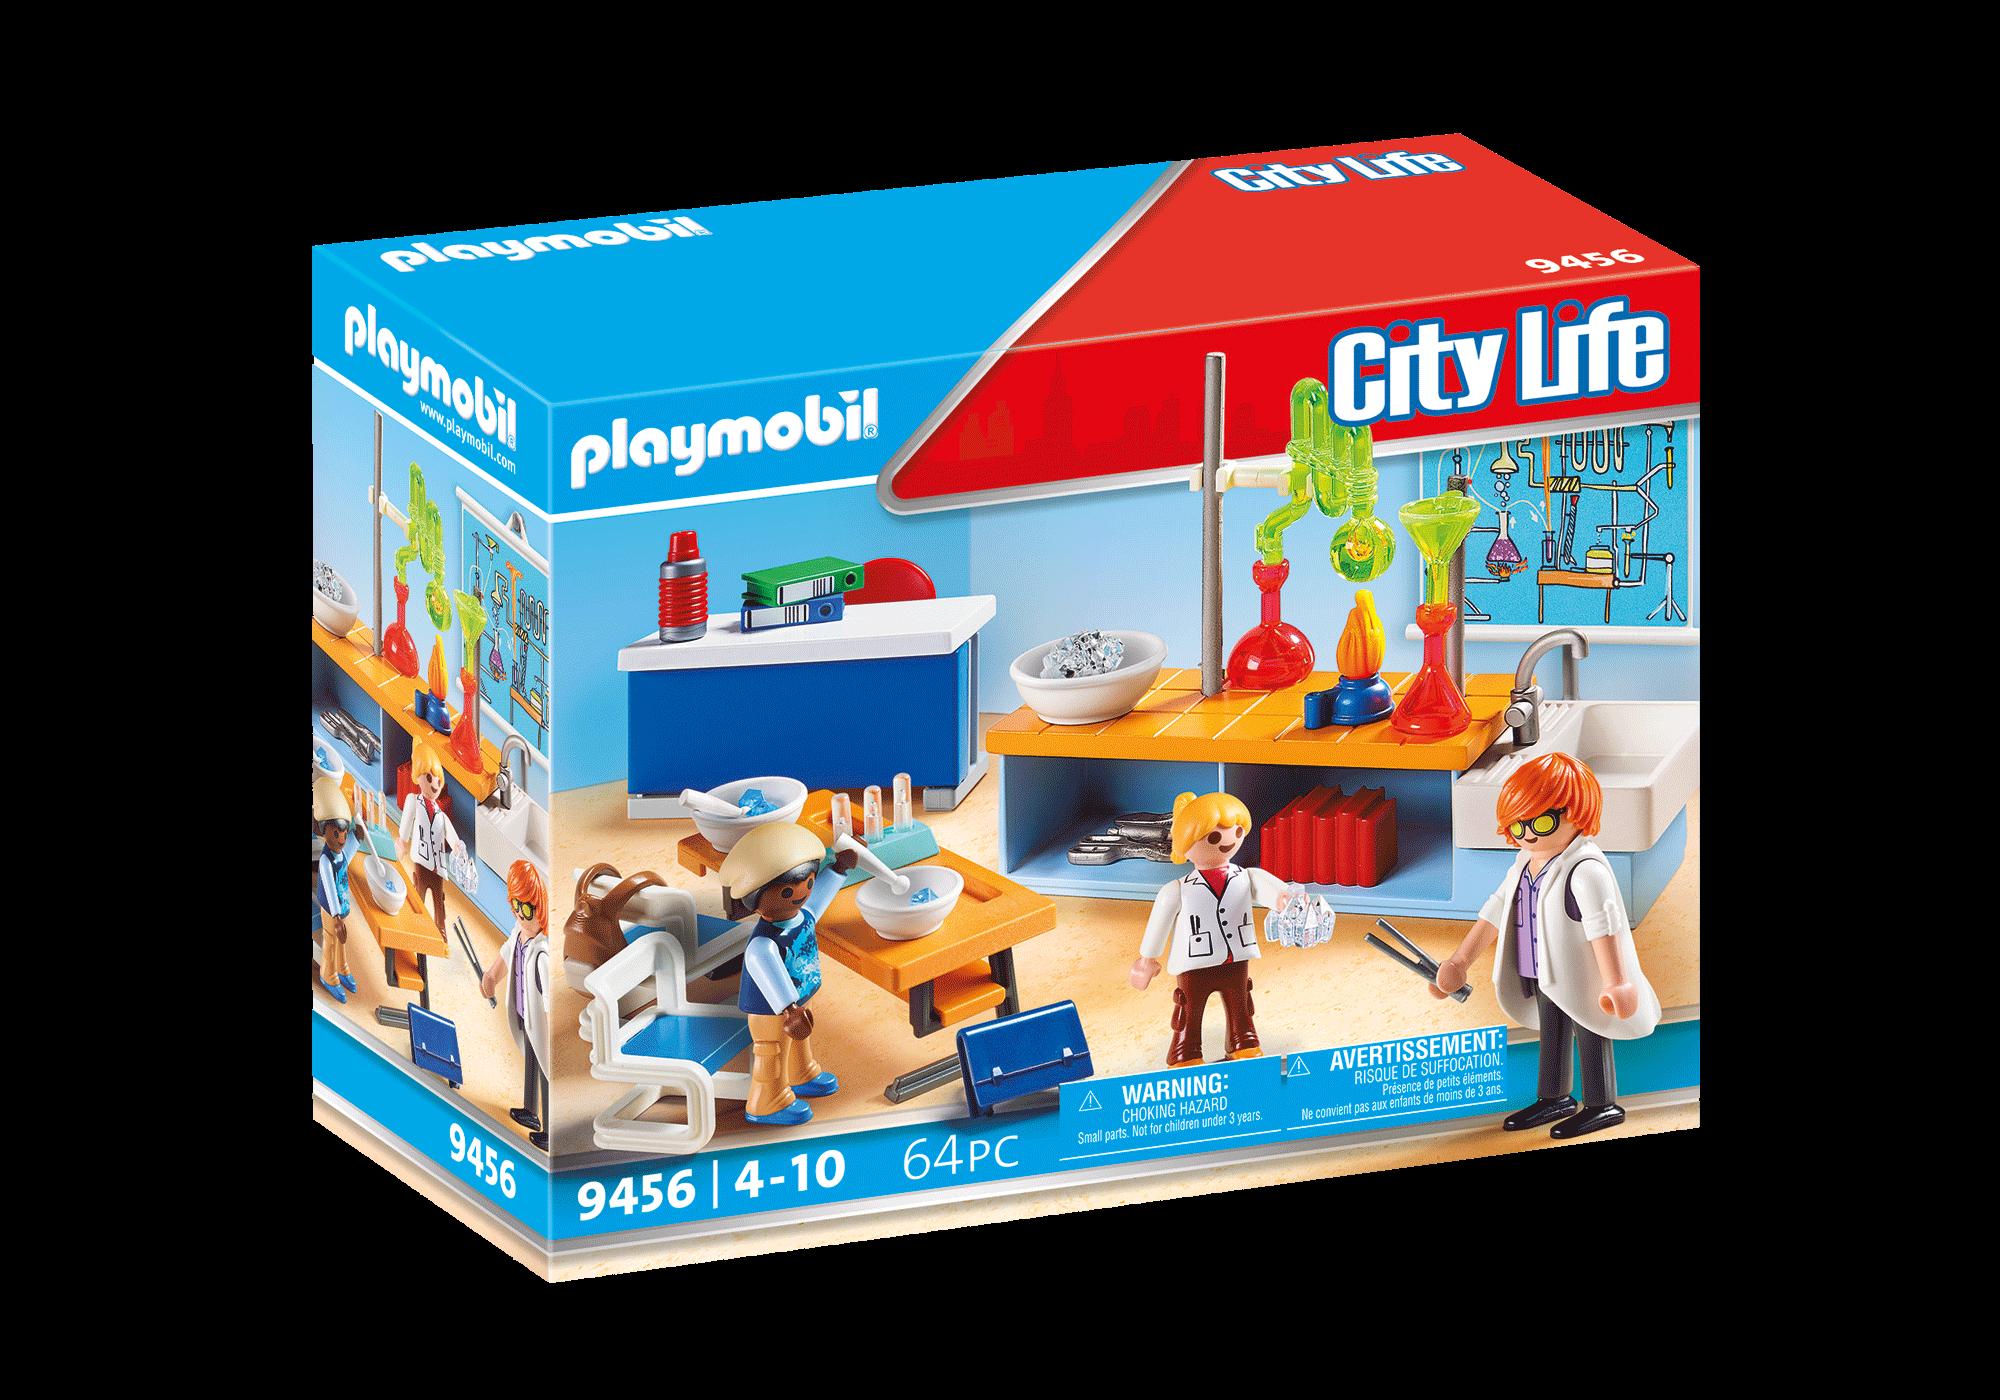 http://media.playmobil.com/i/playmobil/9456_product_box_front/Classe de Physique Chimie